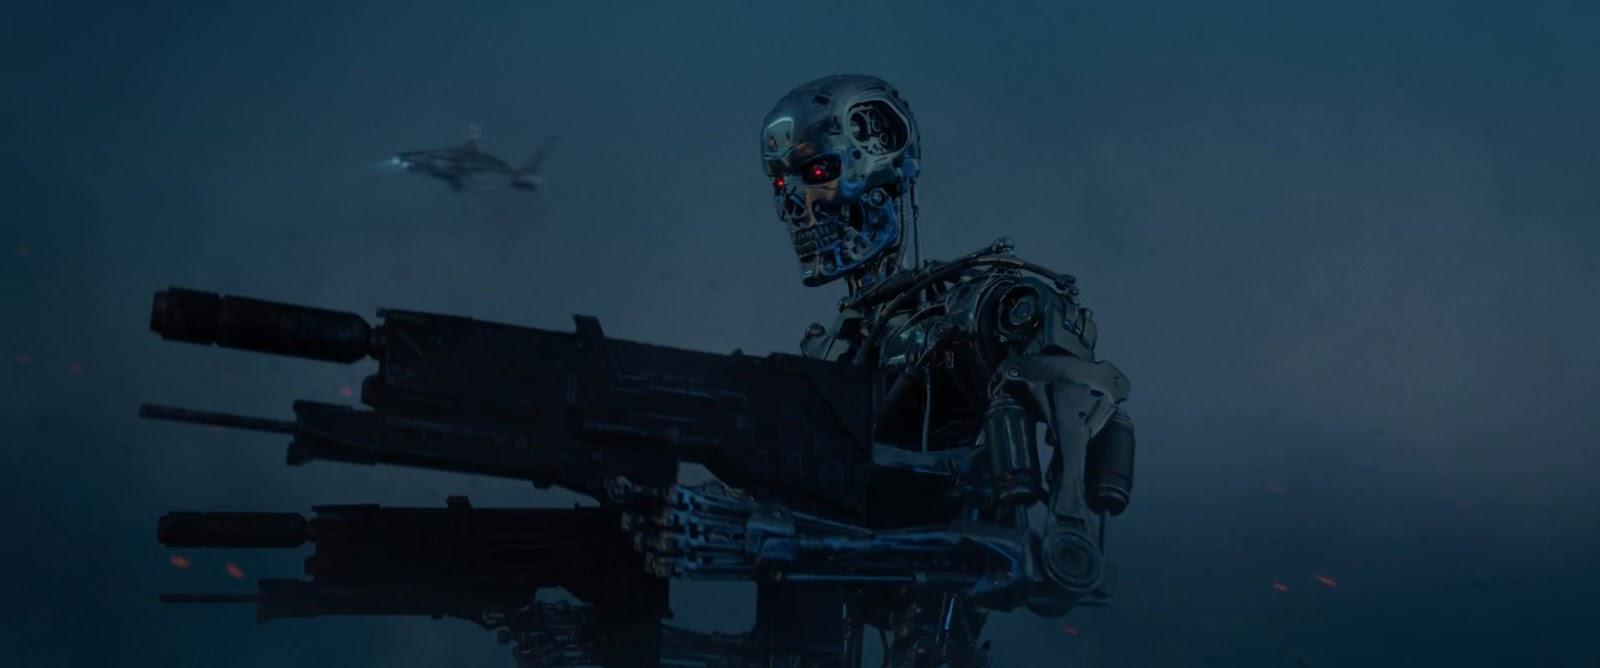 Terminator+Destino+oculto+%282019%29+HD+1080p+WEB-DL+Latino+-+Ingles+-+Descargatepelis.com.mkv_snapshot_00.02.43_%5B2020.01.14_01.06.39%5D.jpg (1600×668)